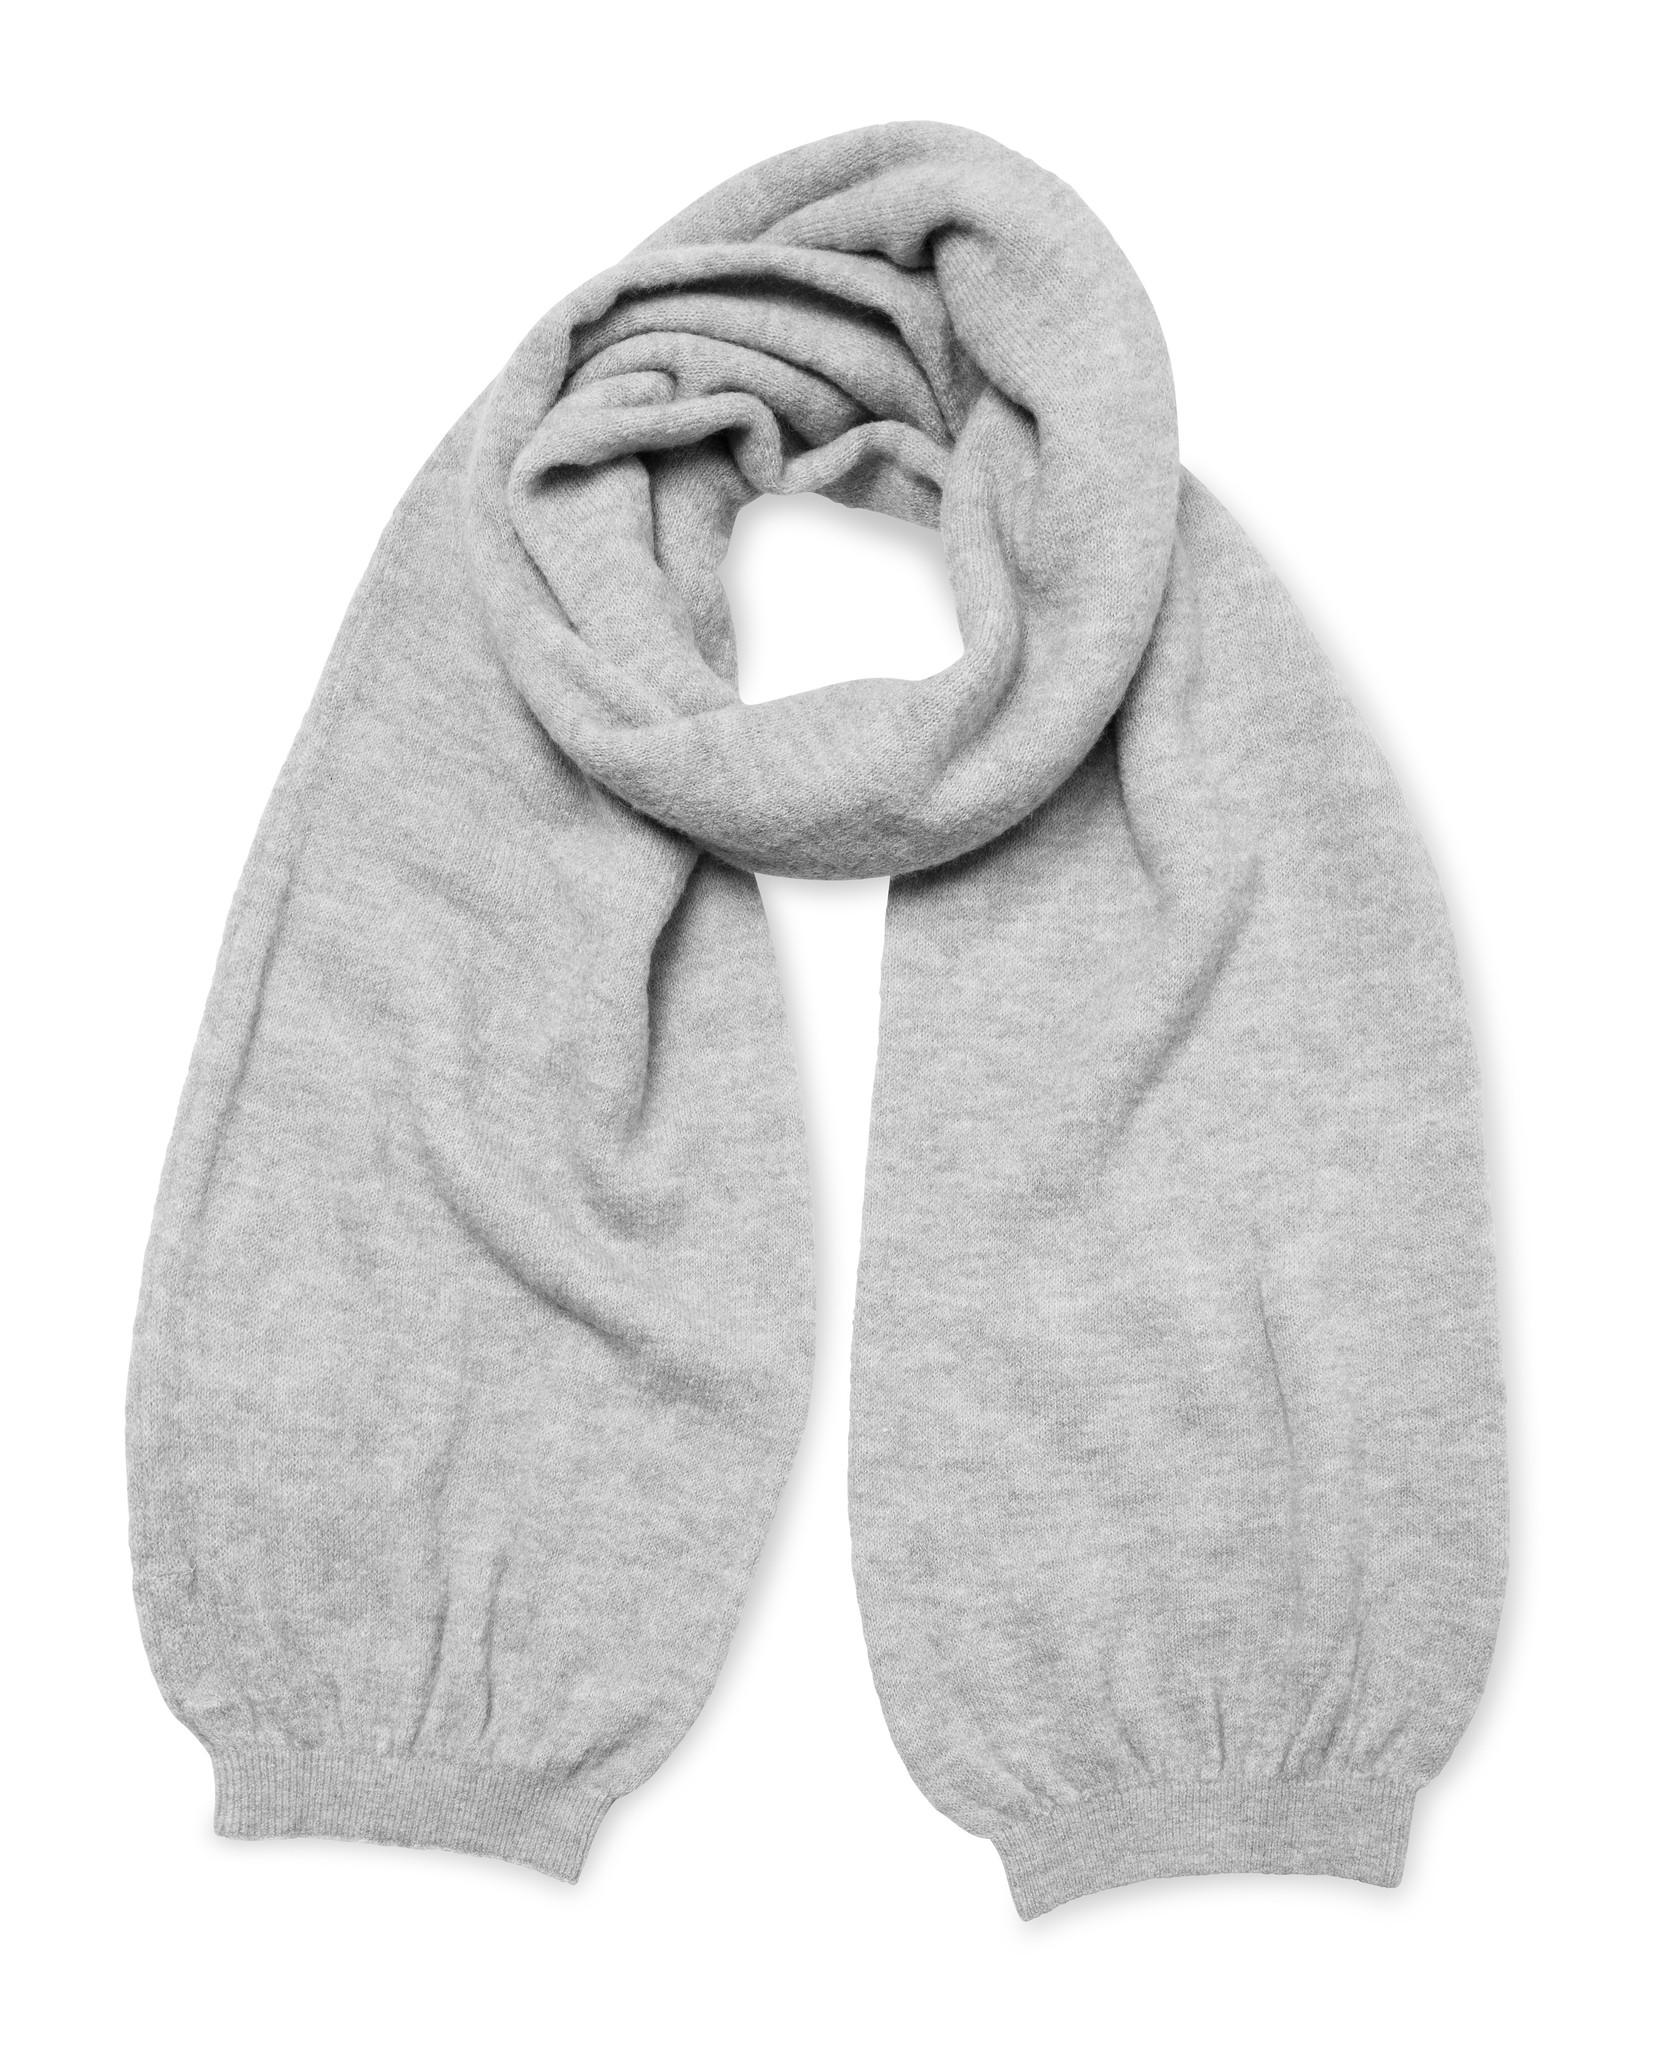 yaya Knitted cuff scarf 130009-123-1